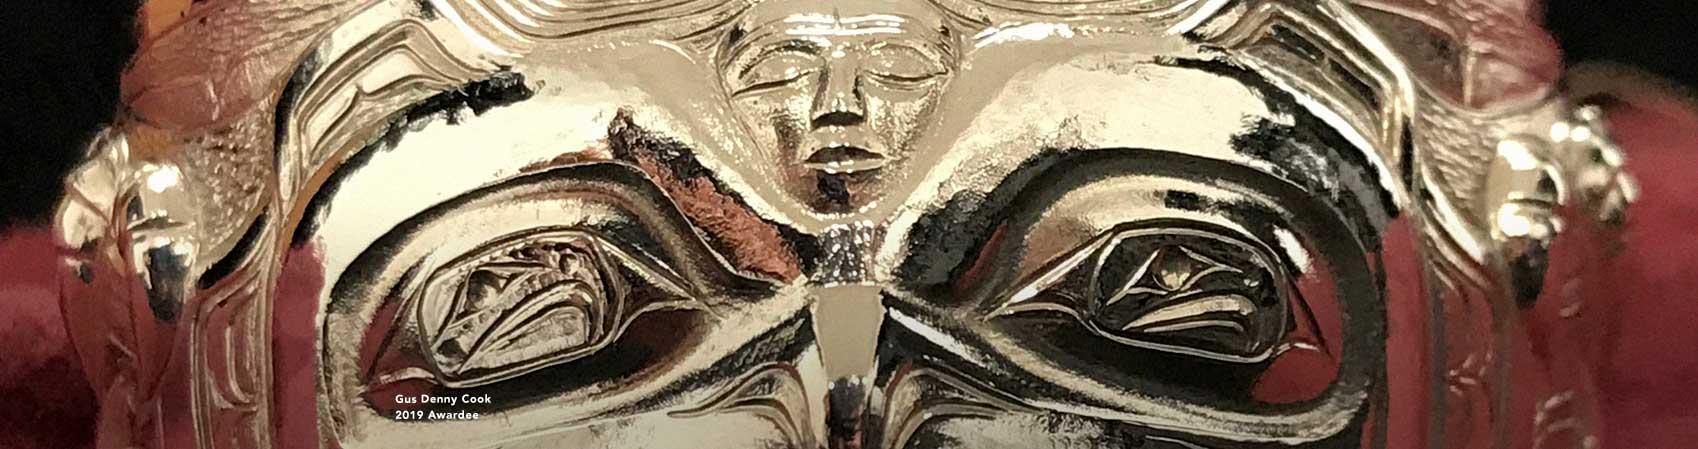 BC Achievement Fulmer Award First Nations Art 2020